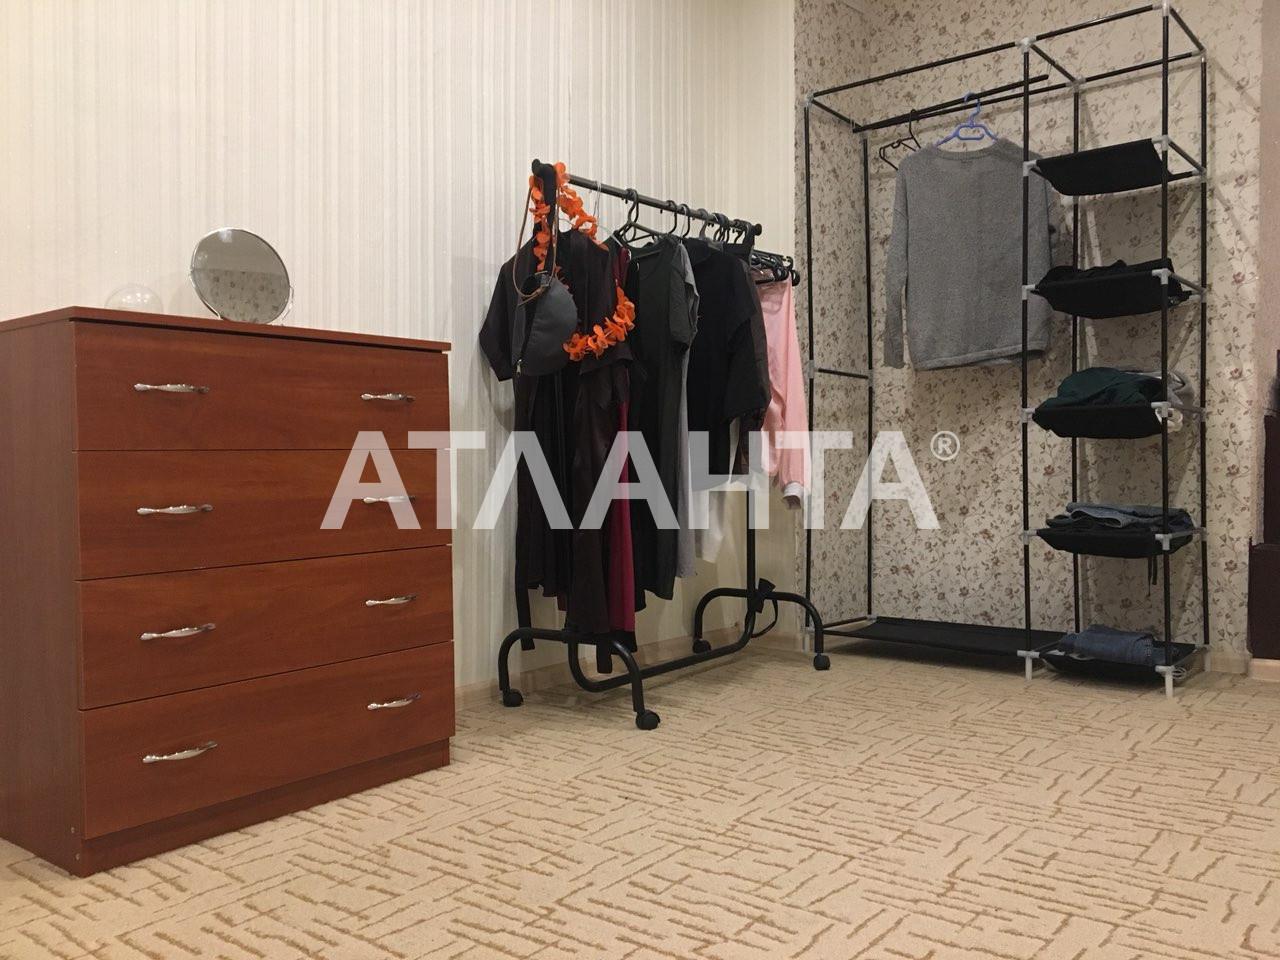 Сдается 1-комнатная Квартира на ул. Мясоедовская (Шолом Алейхема) — 259 у.е./мес. (фото №2)